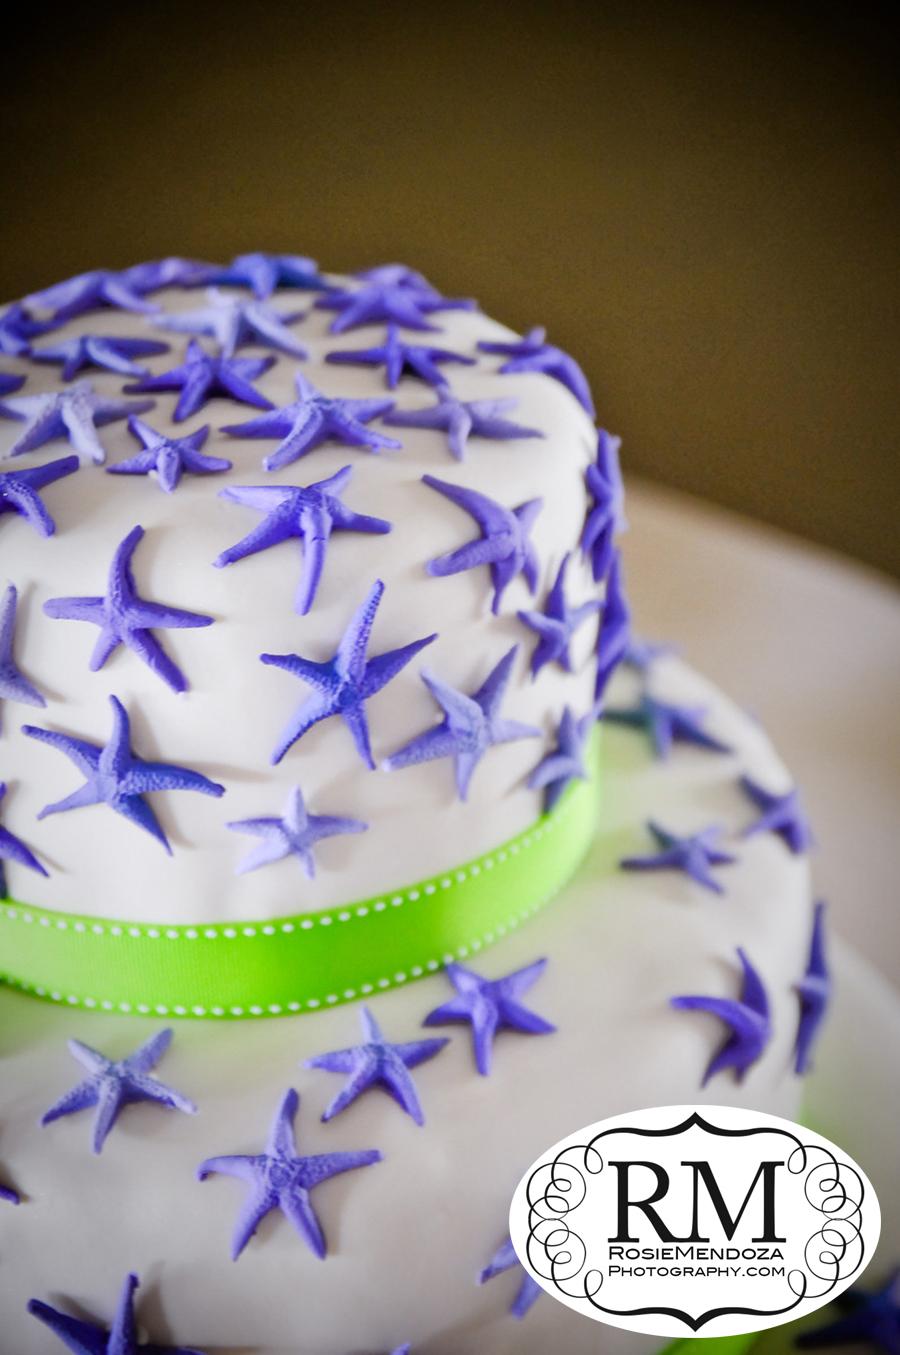 Delray-Beach-Club-wedding-cake-photo